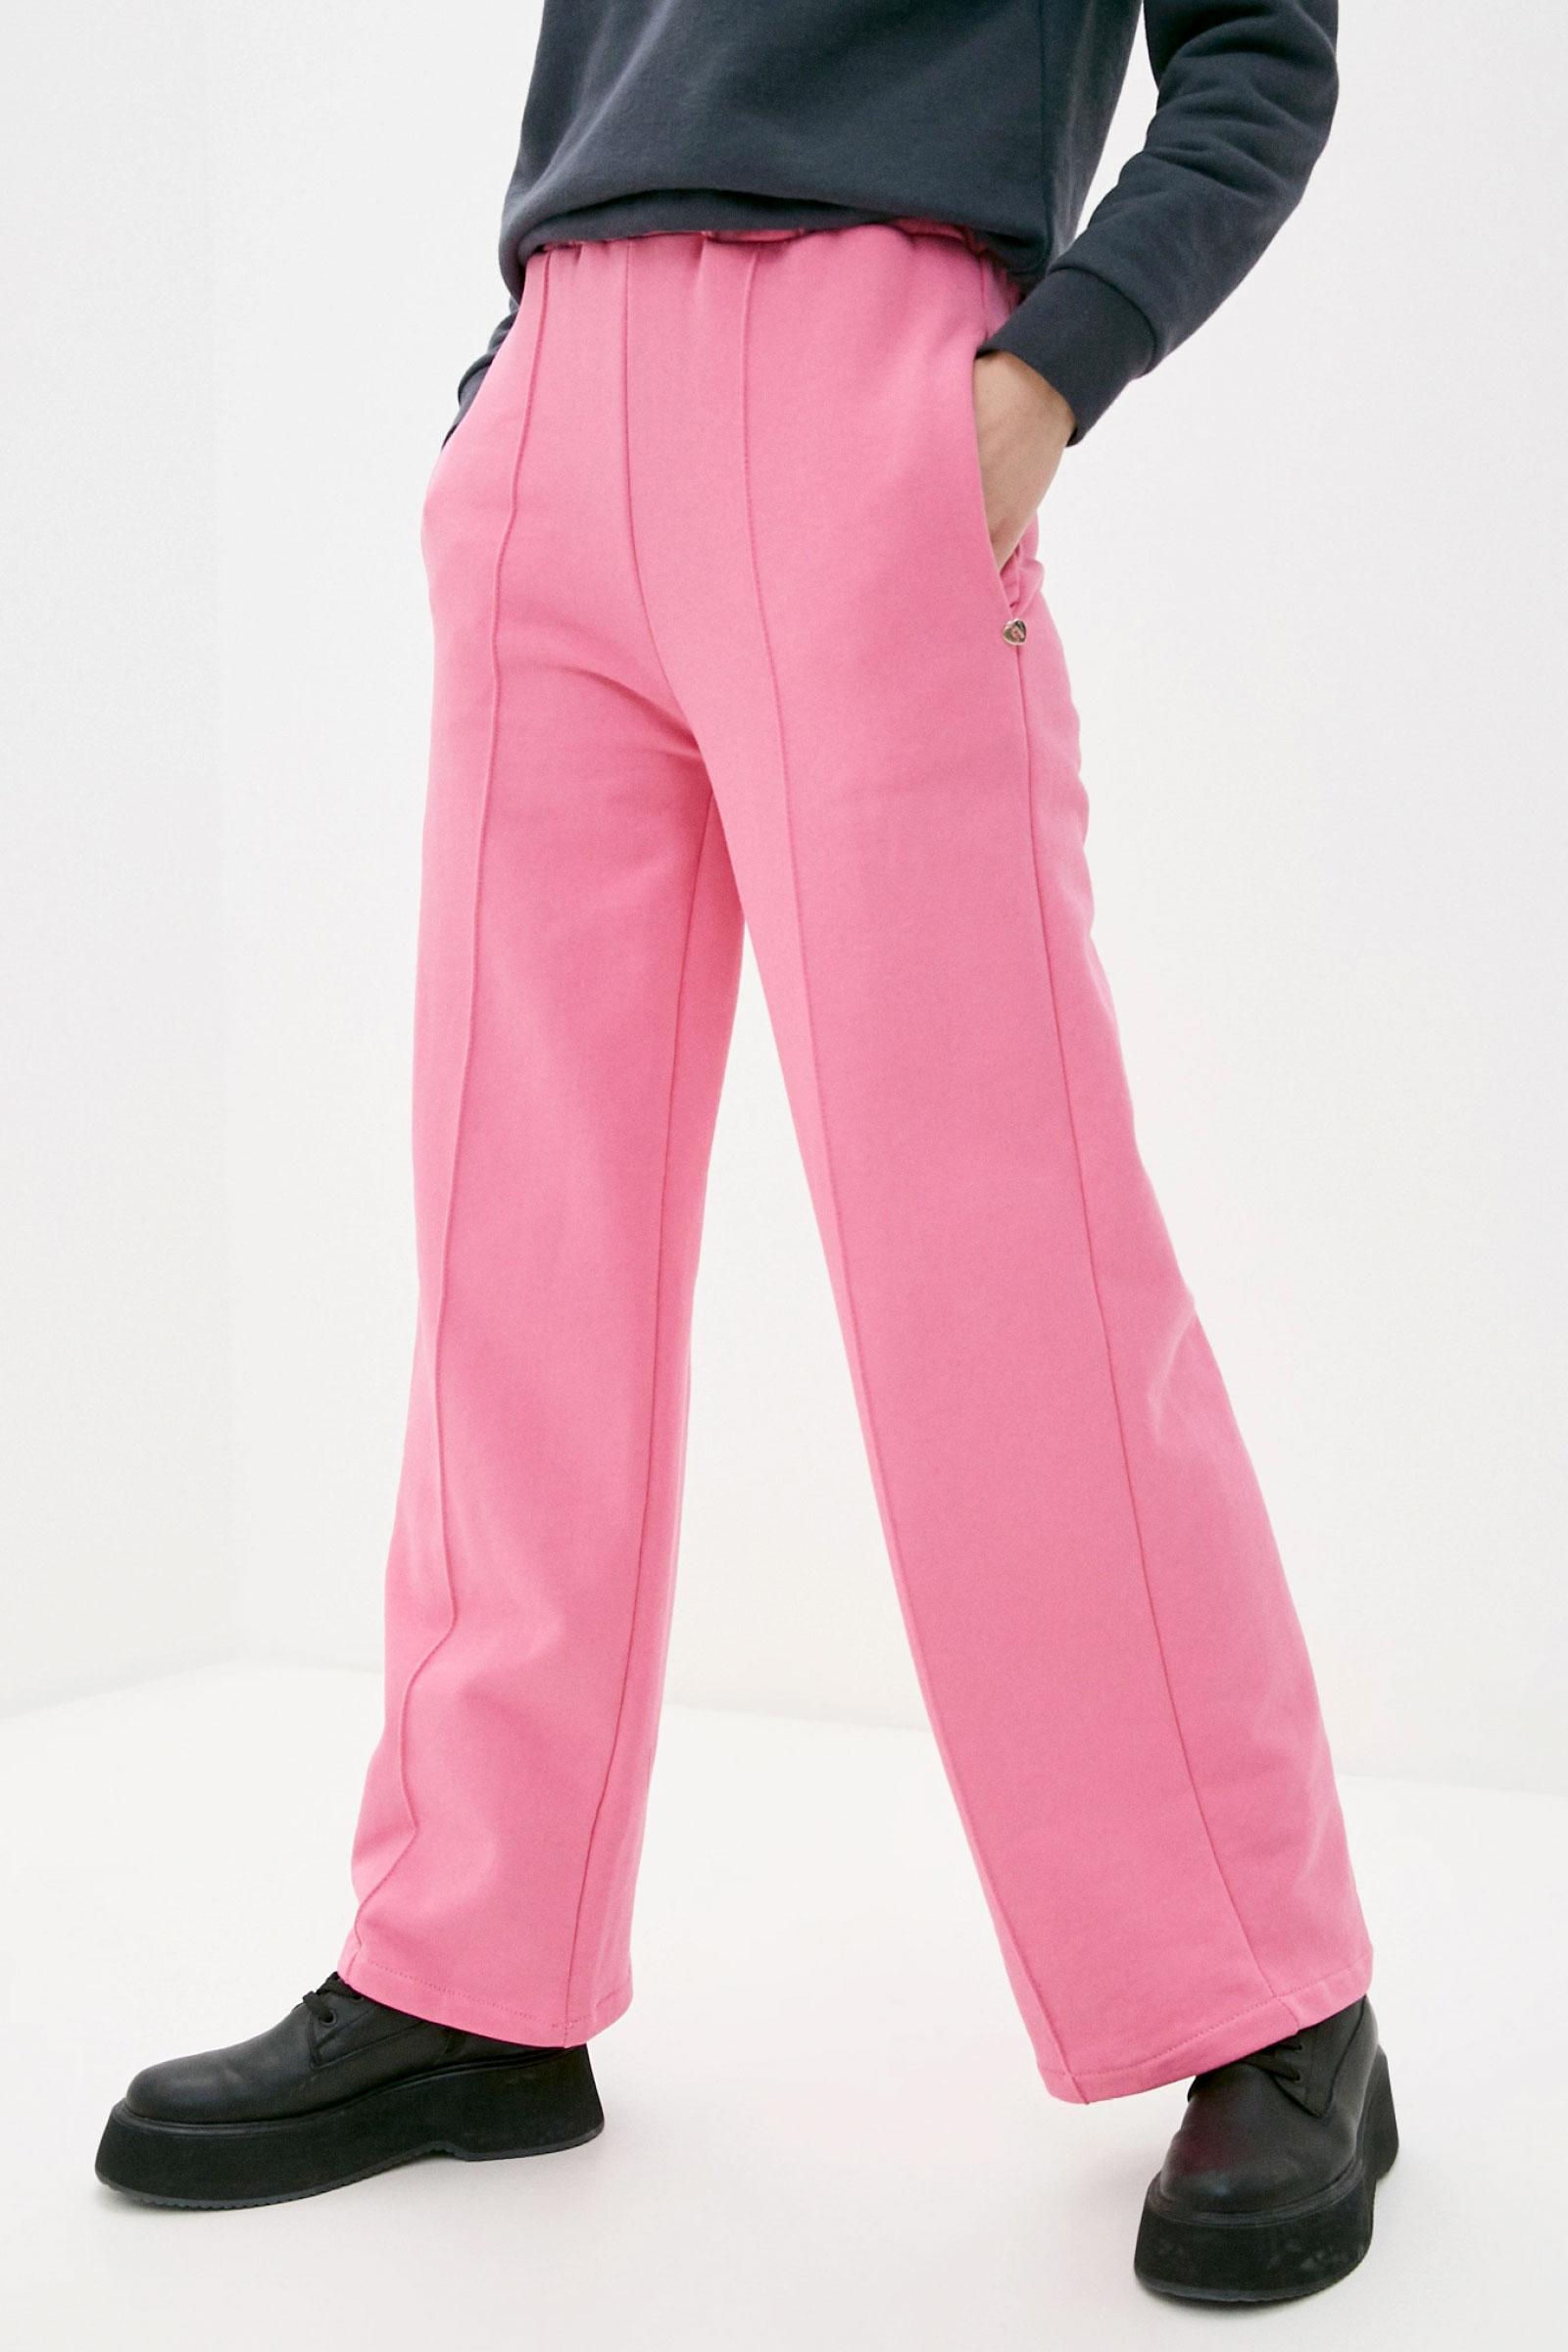 RINASCIMENTO Pantalone Donna RINASCIMENTO | Pantalone | CFC0102174003B215